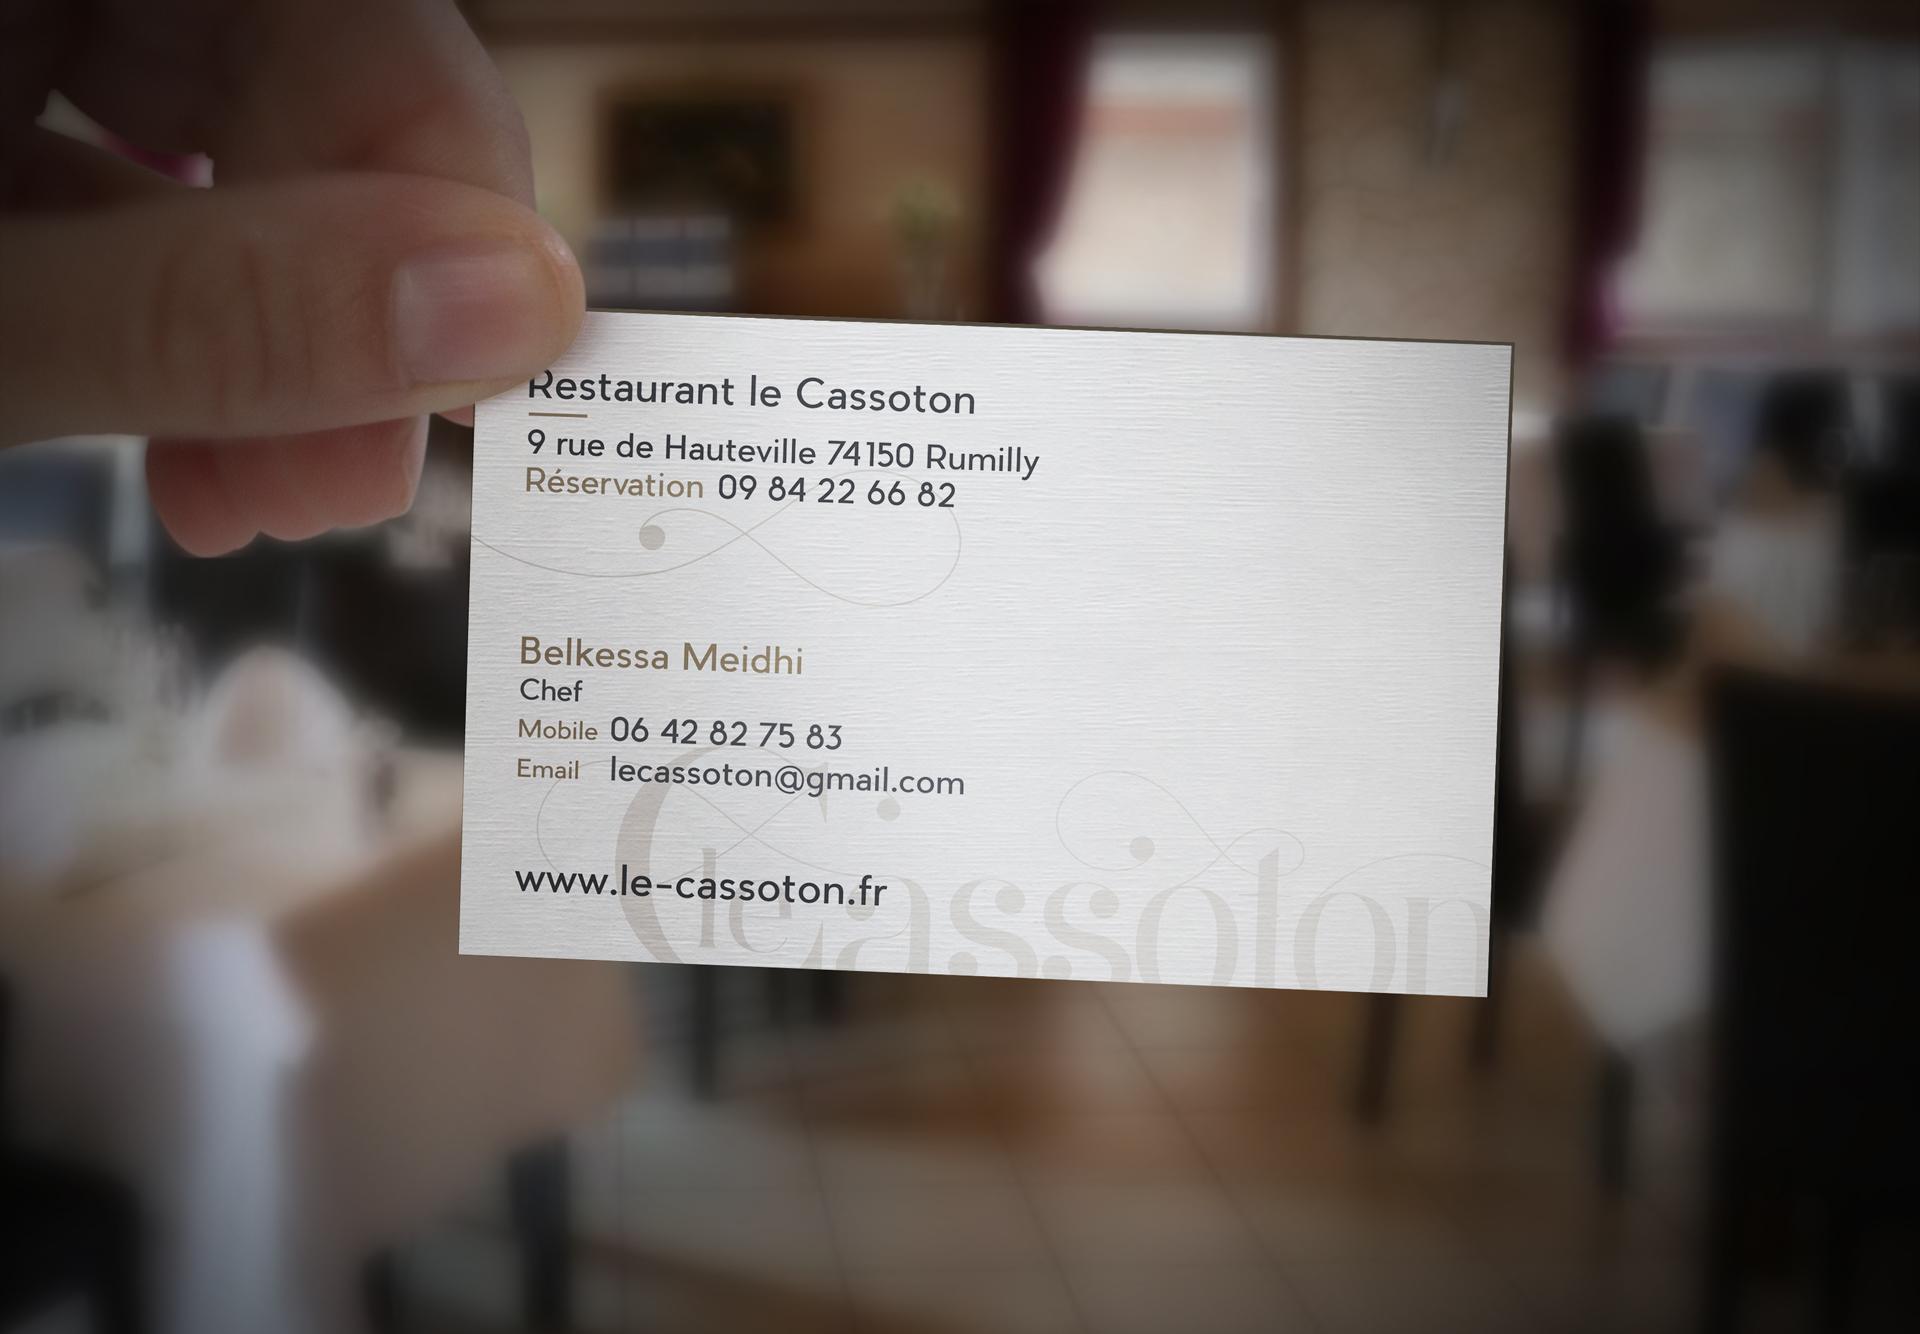 Le Cassoton – Carte de visite verso